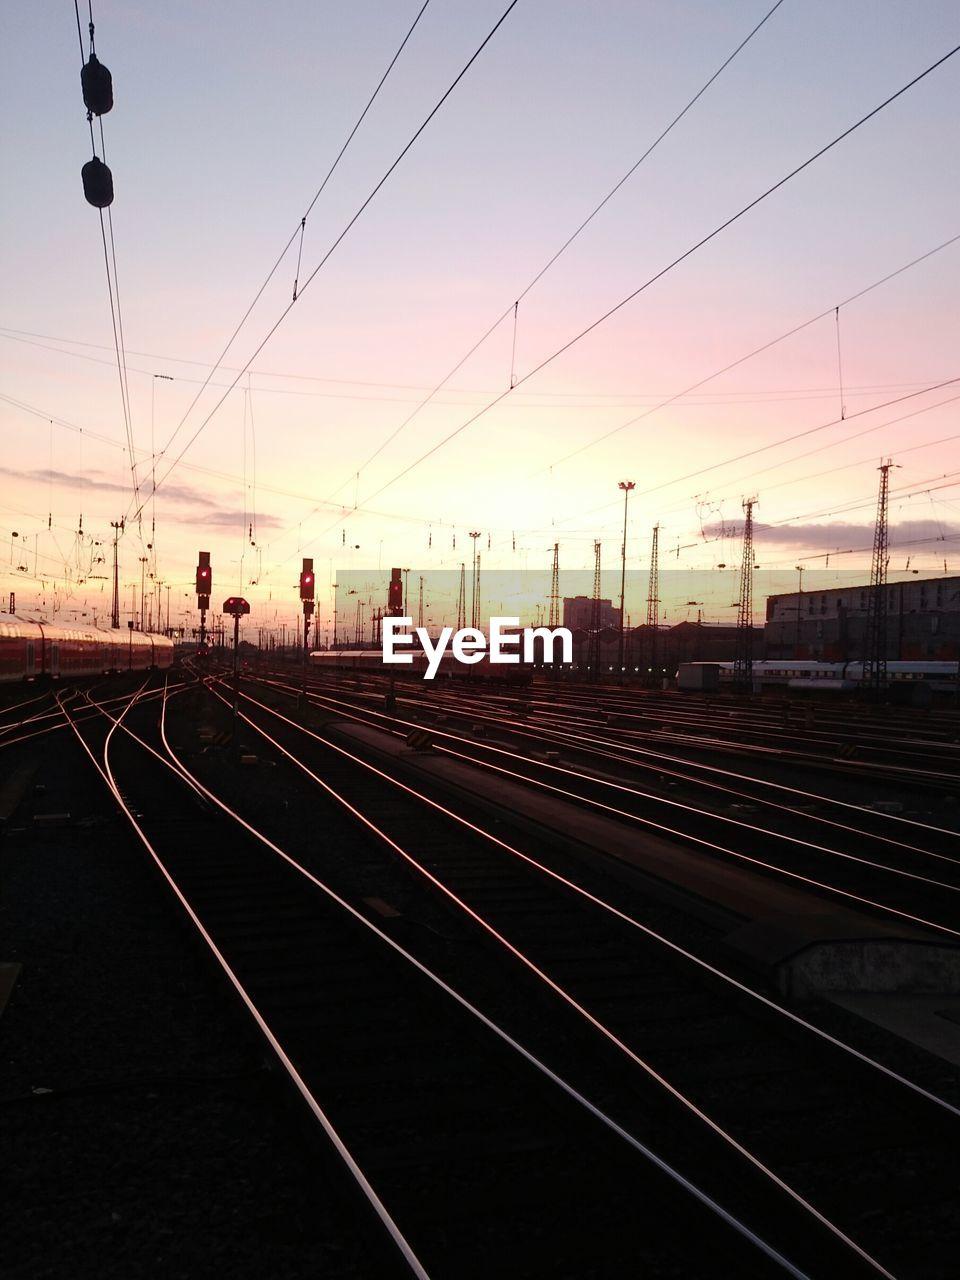 Surface level of railway tracks at sunset